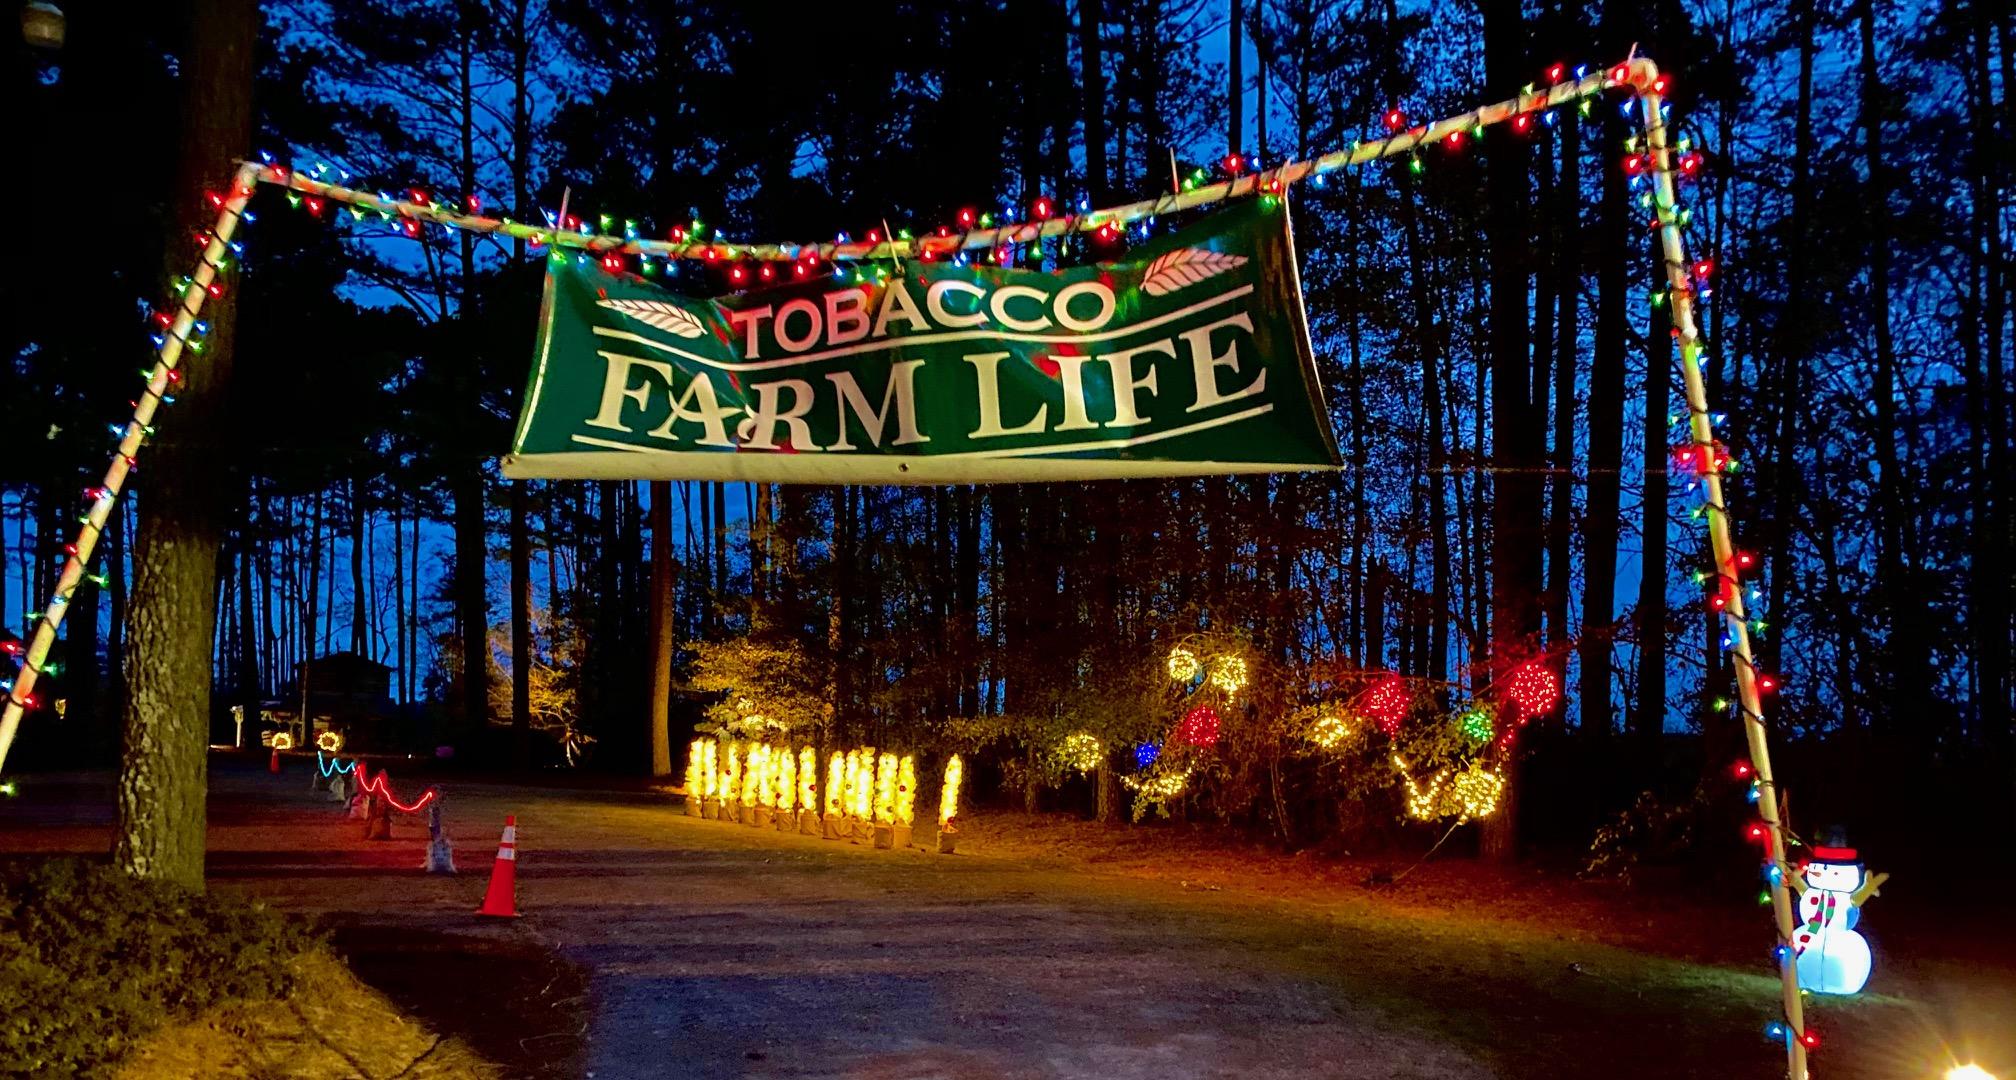 Tobacco Farm Life banner with Christmas lights